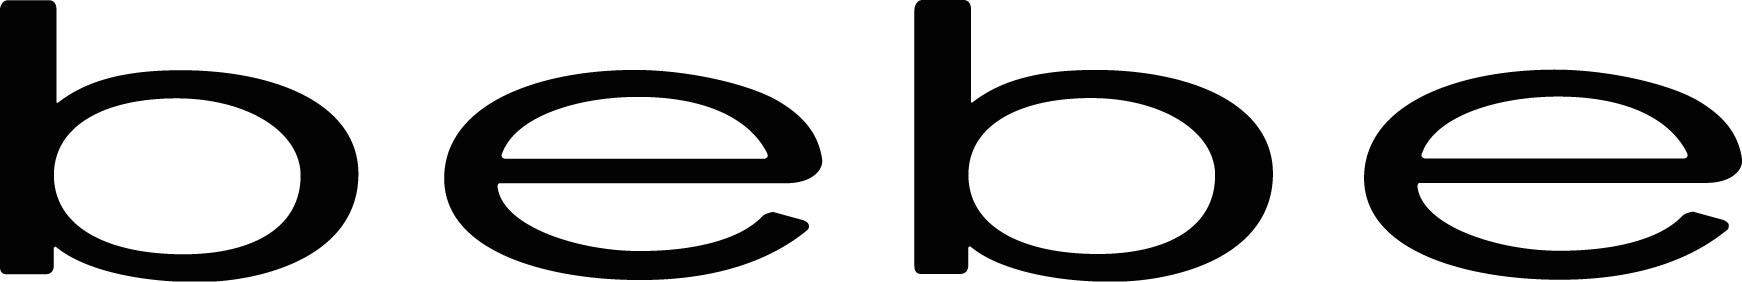 Bebe logo-woreg.jpg